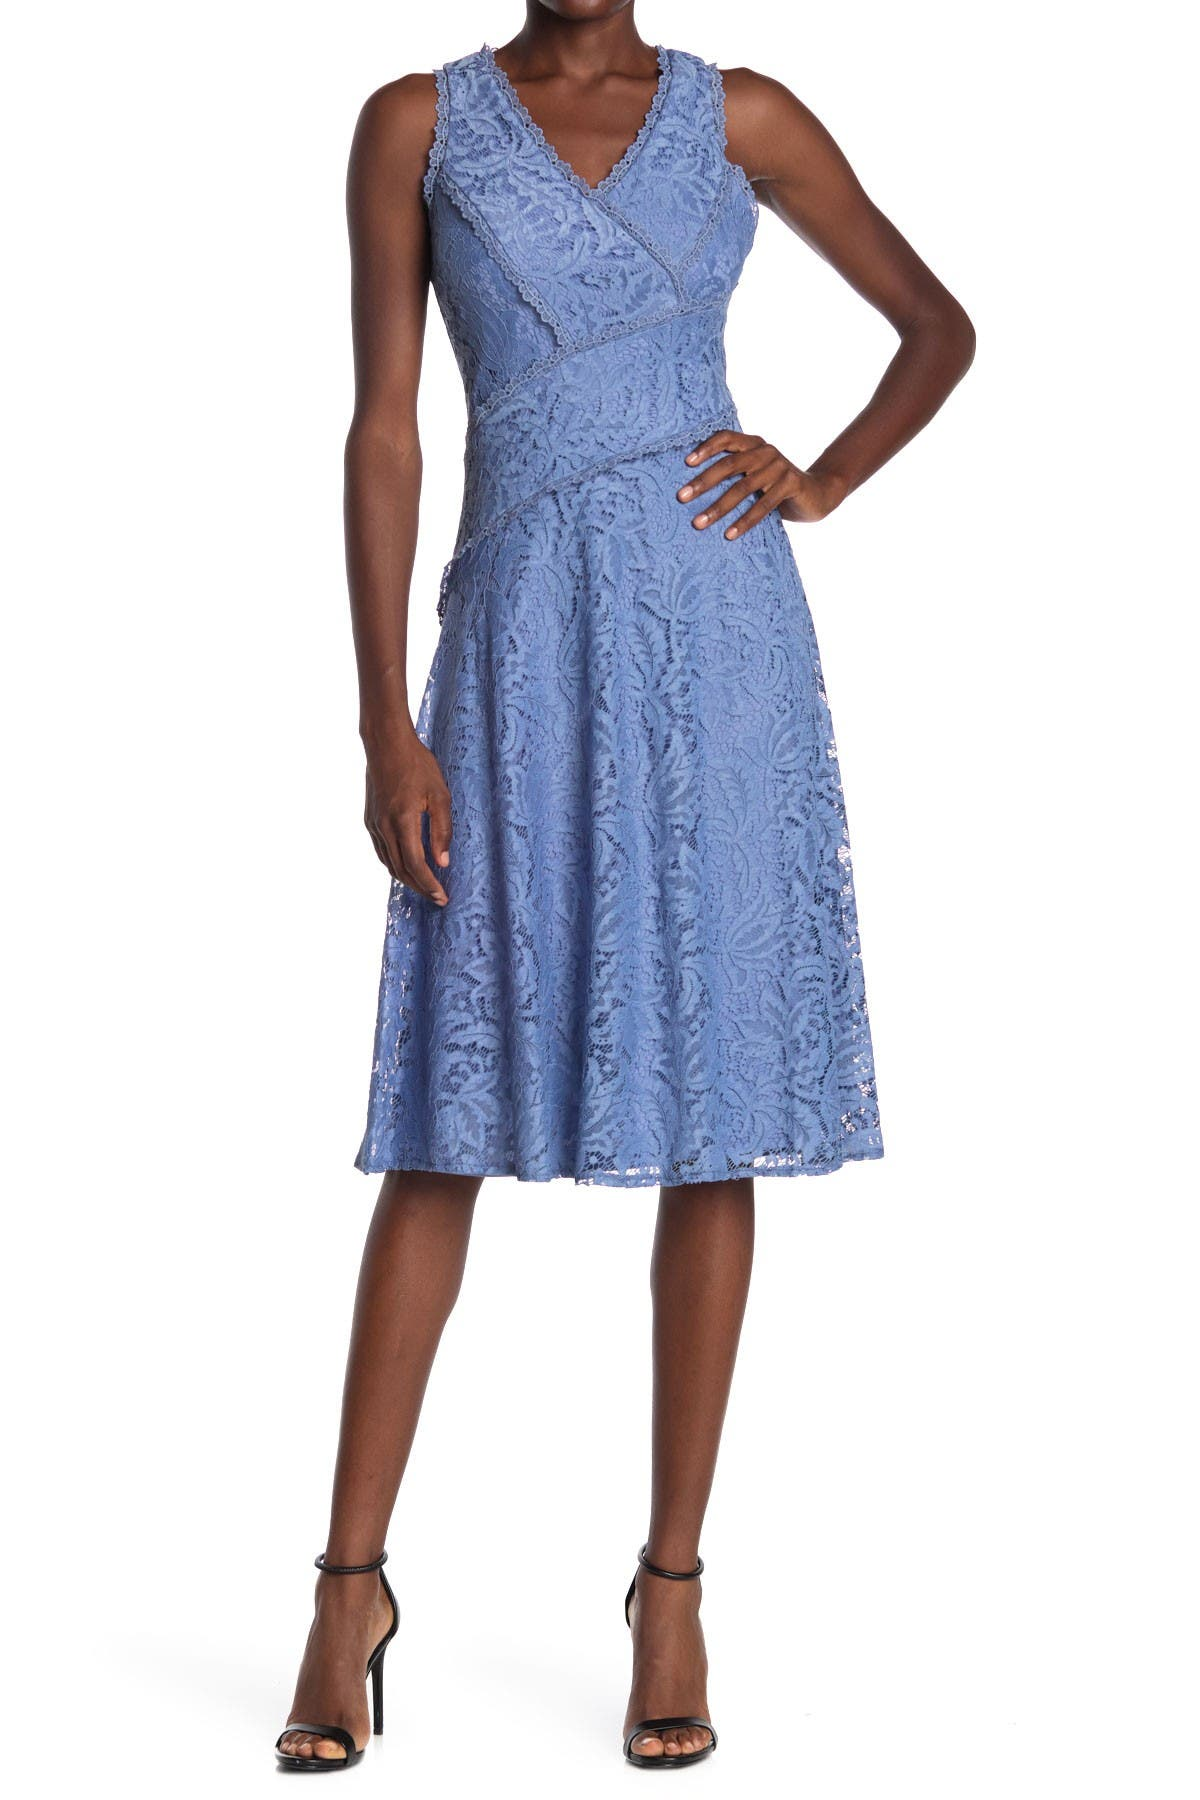 Image of Taylor Asymmetrical Midi Lace Dress